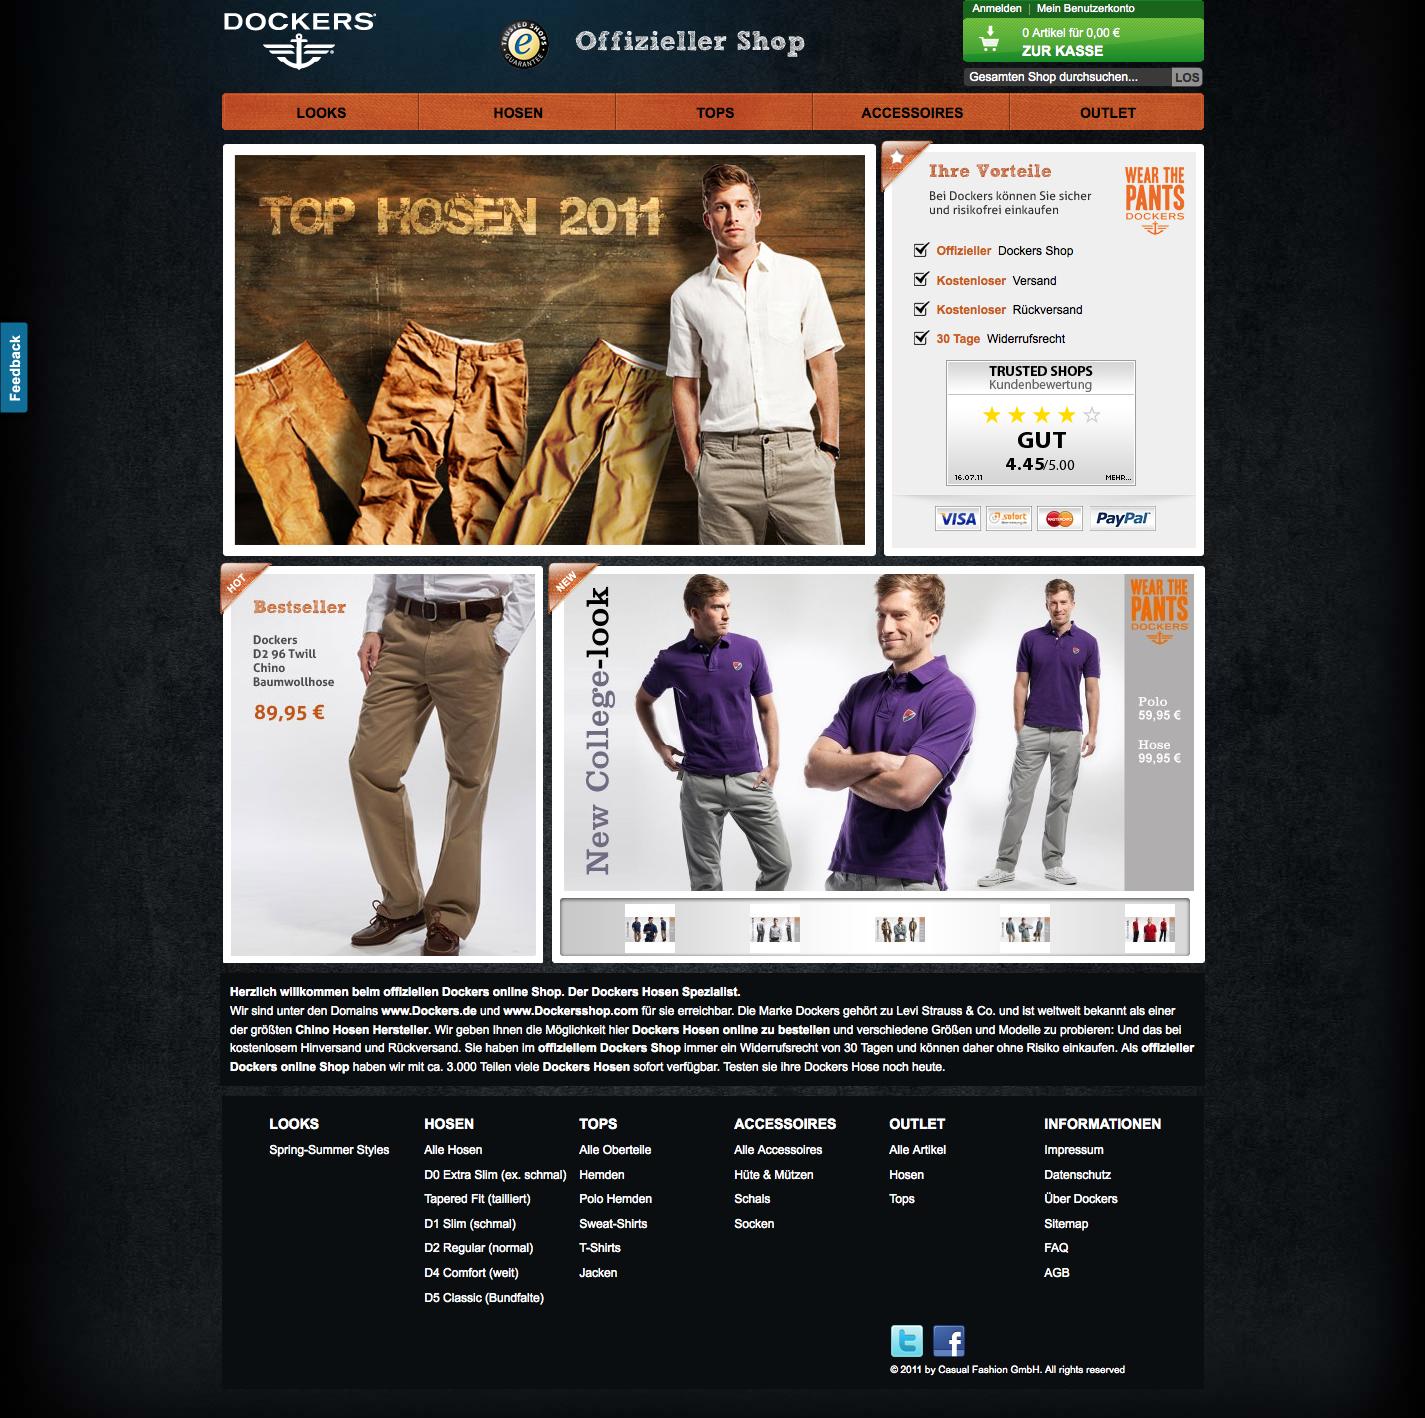 Dockers_Hosen_-_Chino_Hosen_-_Shopping_im_offiziellen_Dockers_Shop_1310812718936